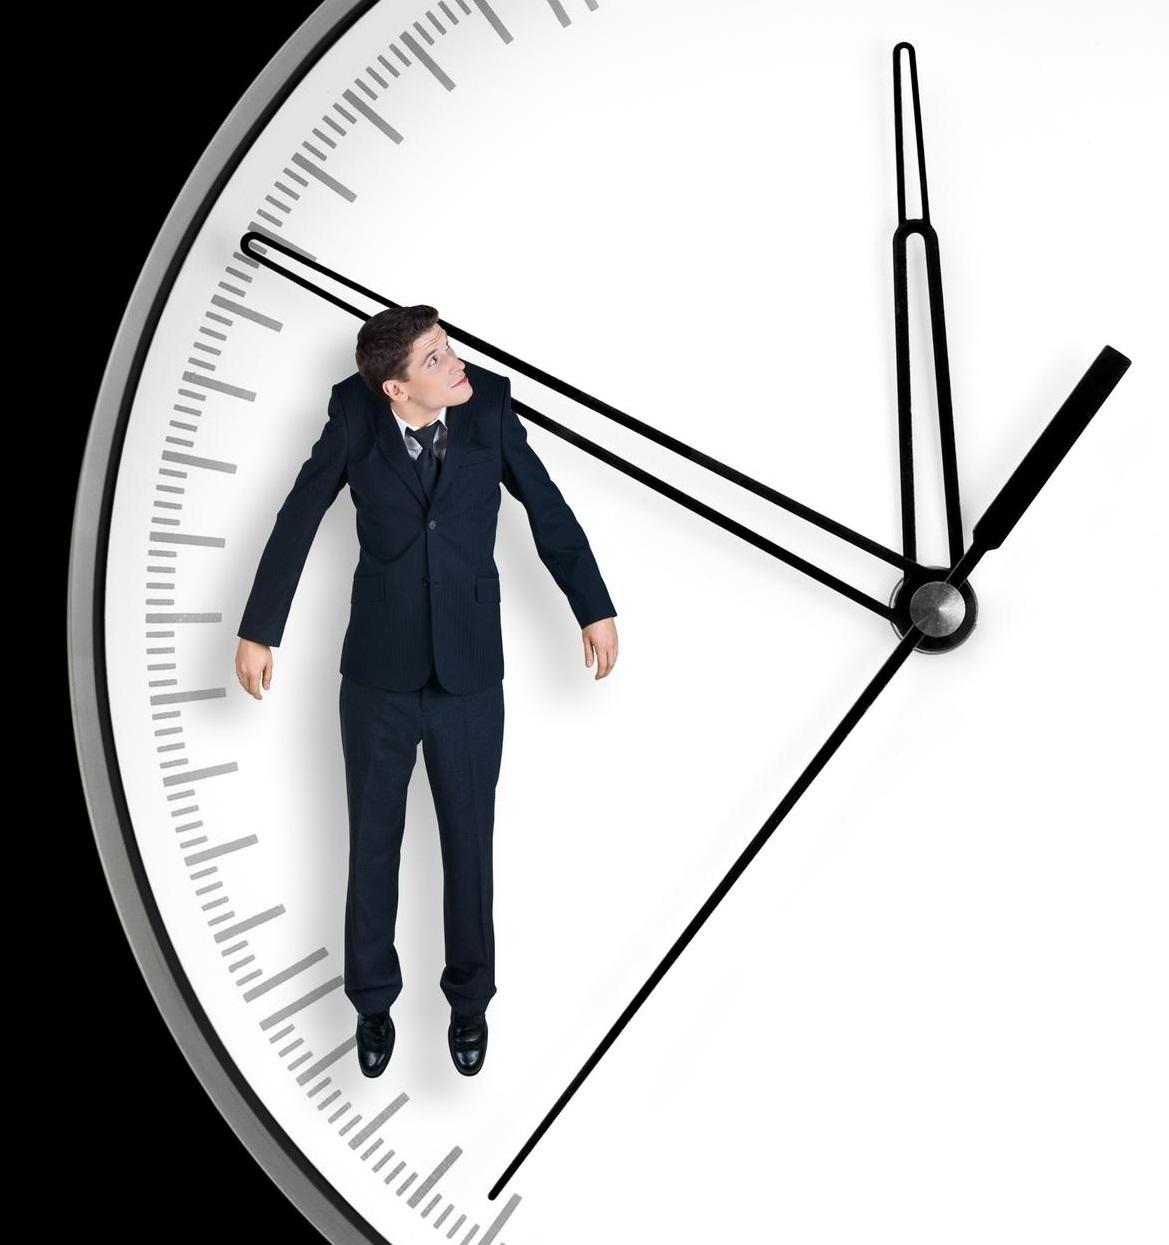 timemanagement.072513